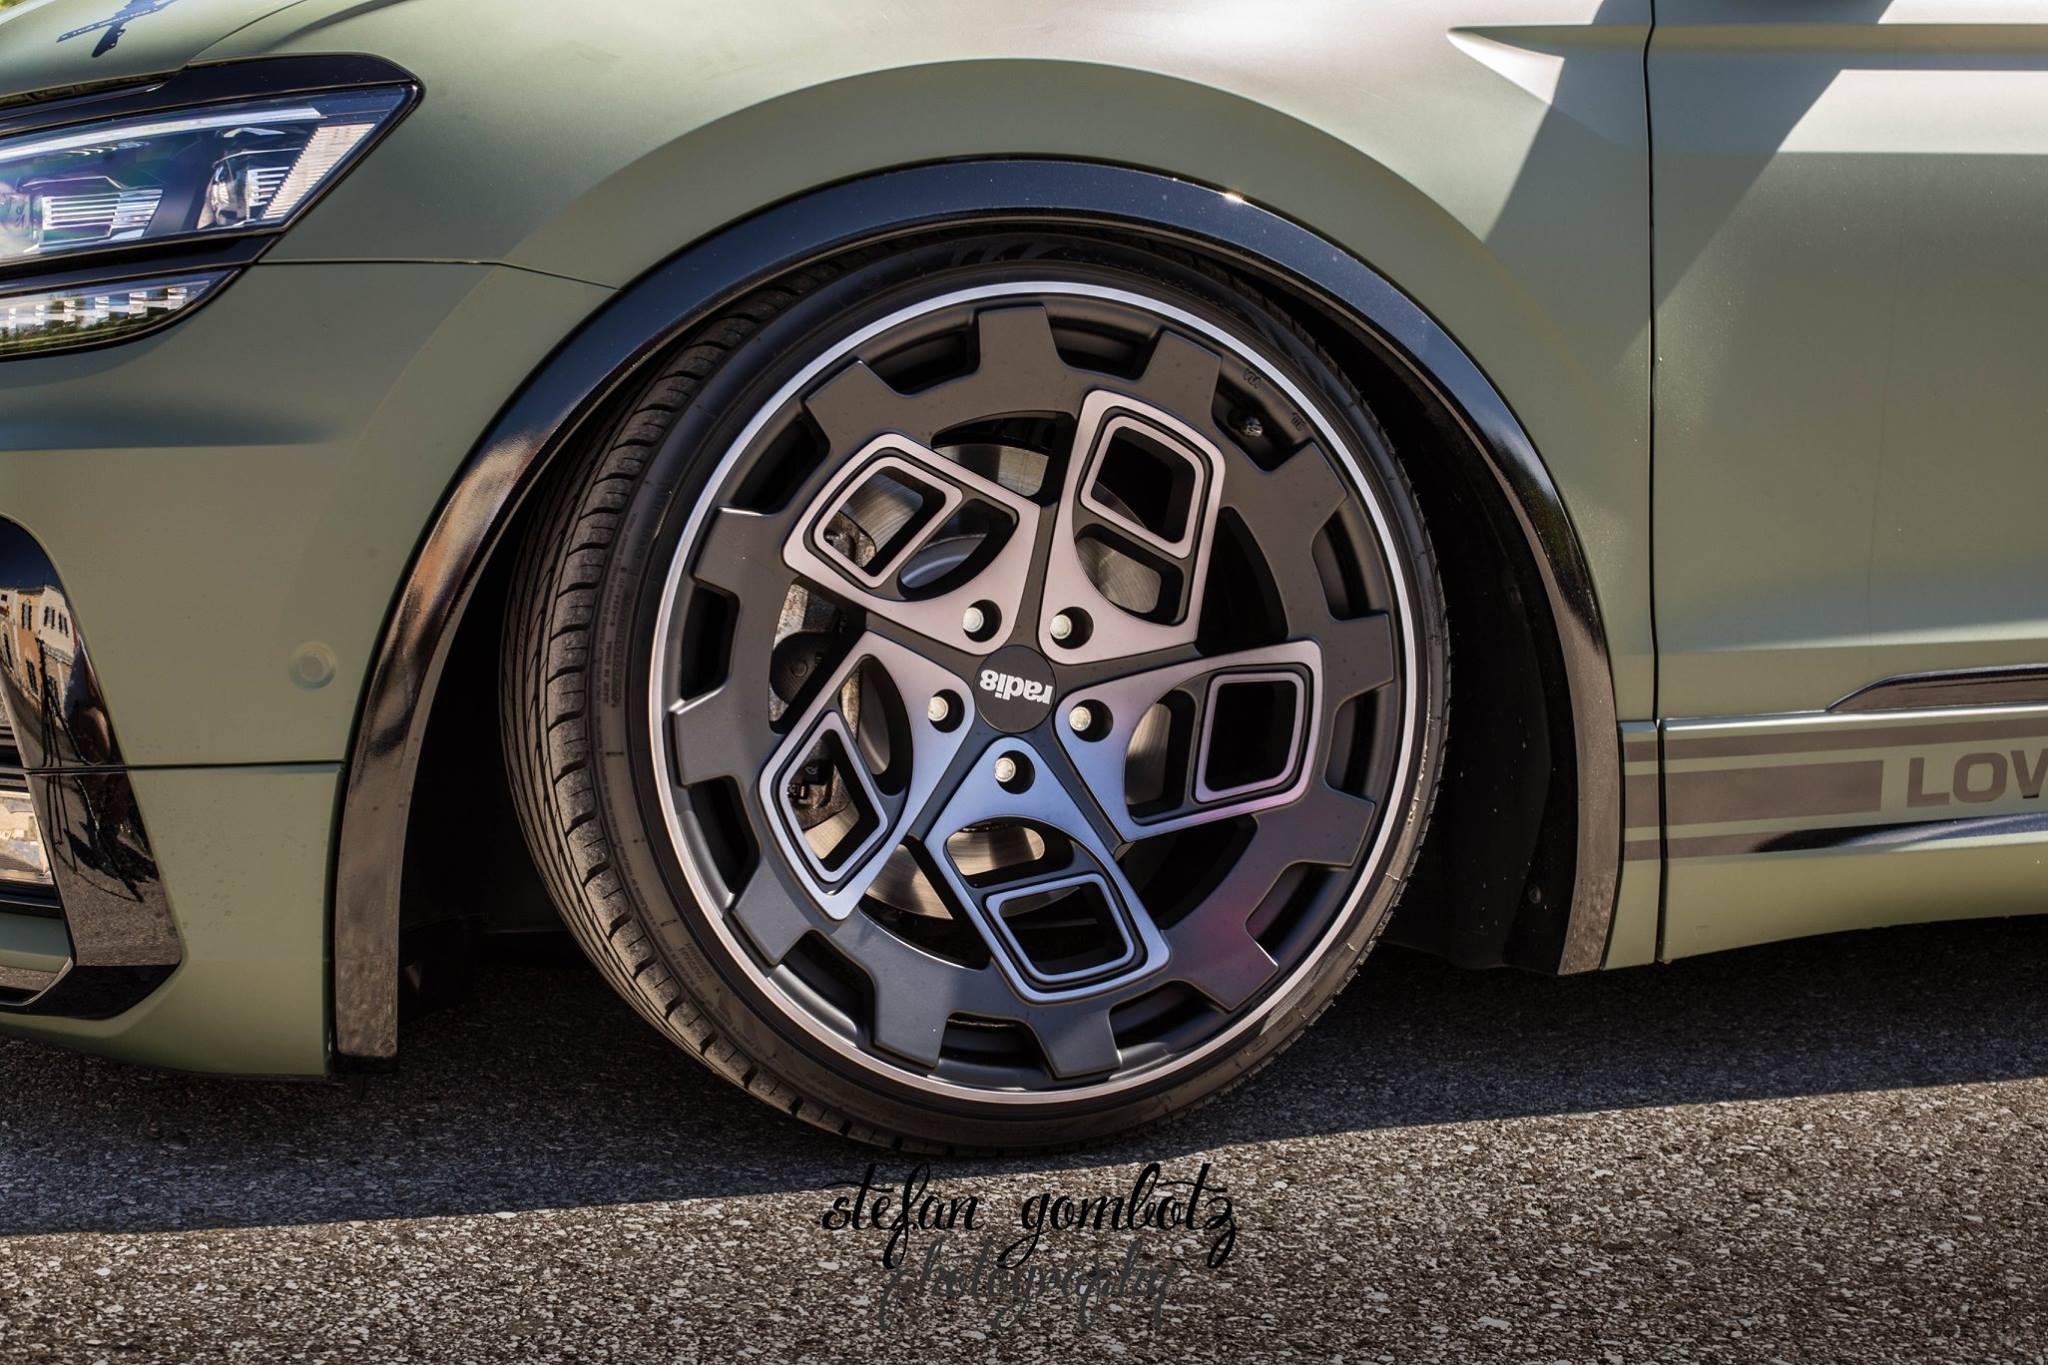 2018 VW Tiguan Lowrider Has RADI8 Wheels, Amry Wrap ...